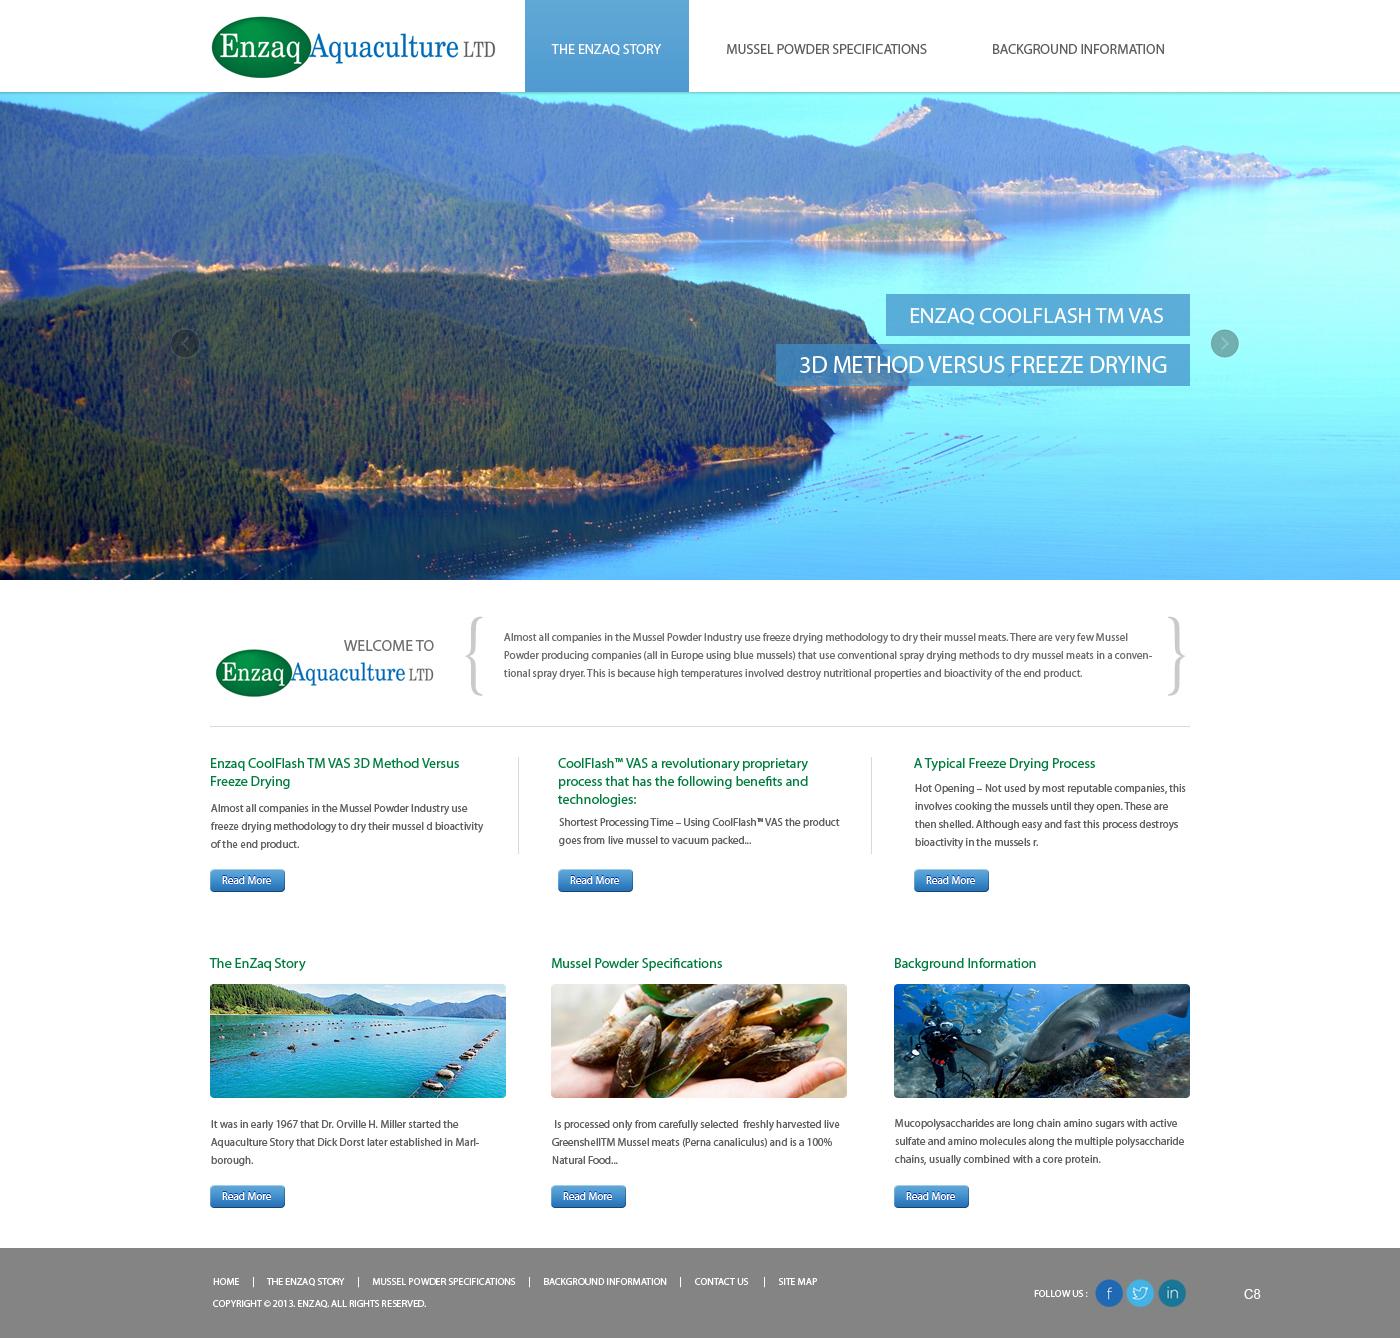 Professional, Upmarket, Pharmaceutical Web Design for Enzaq